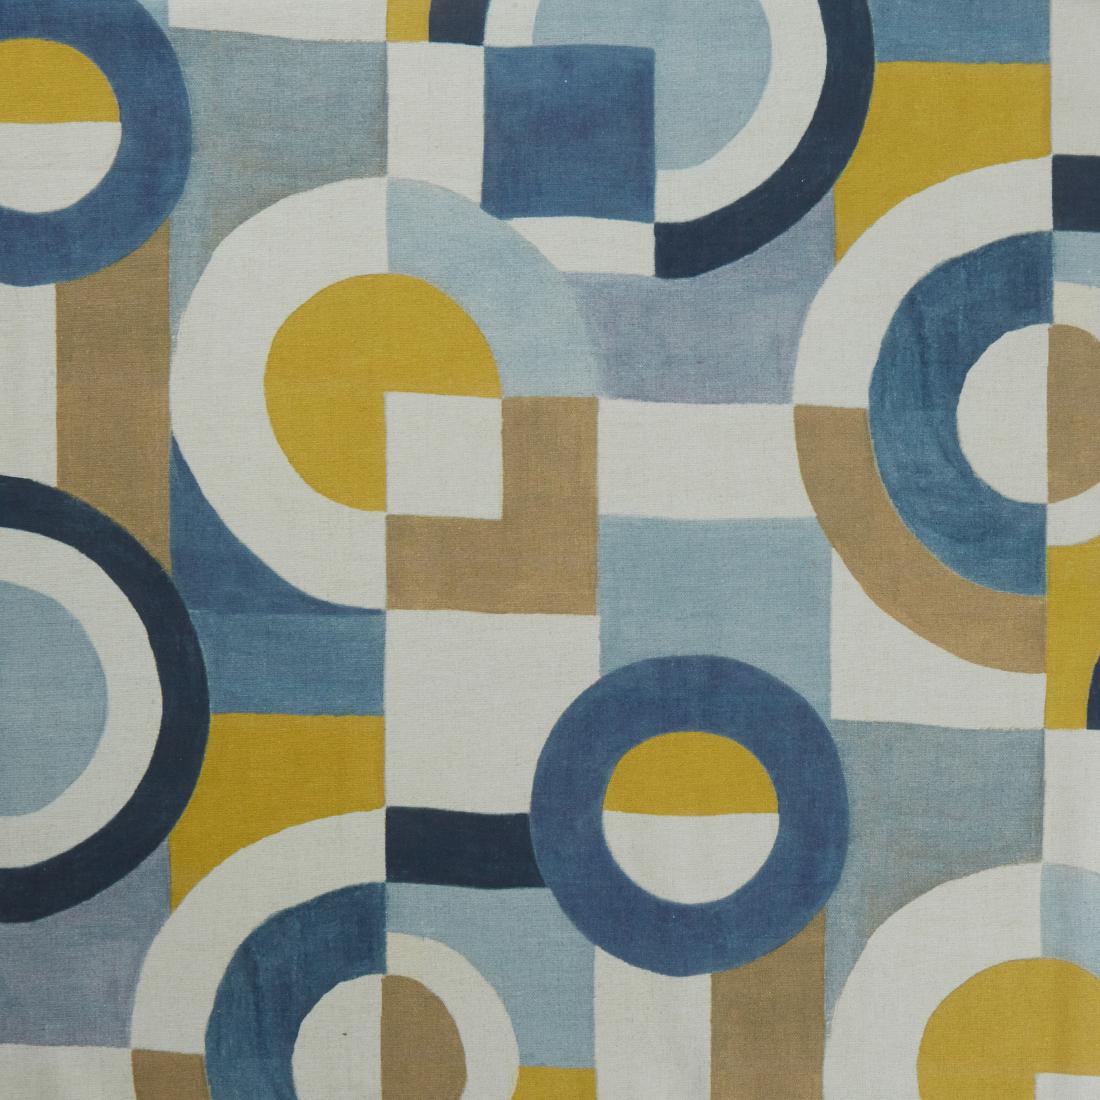 Mondrian Whirlpool Curtain Fabric